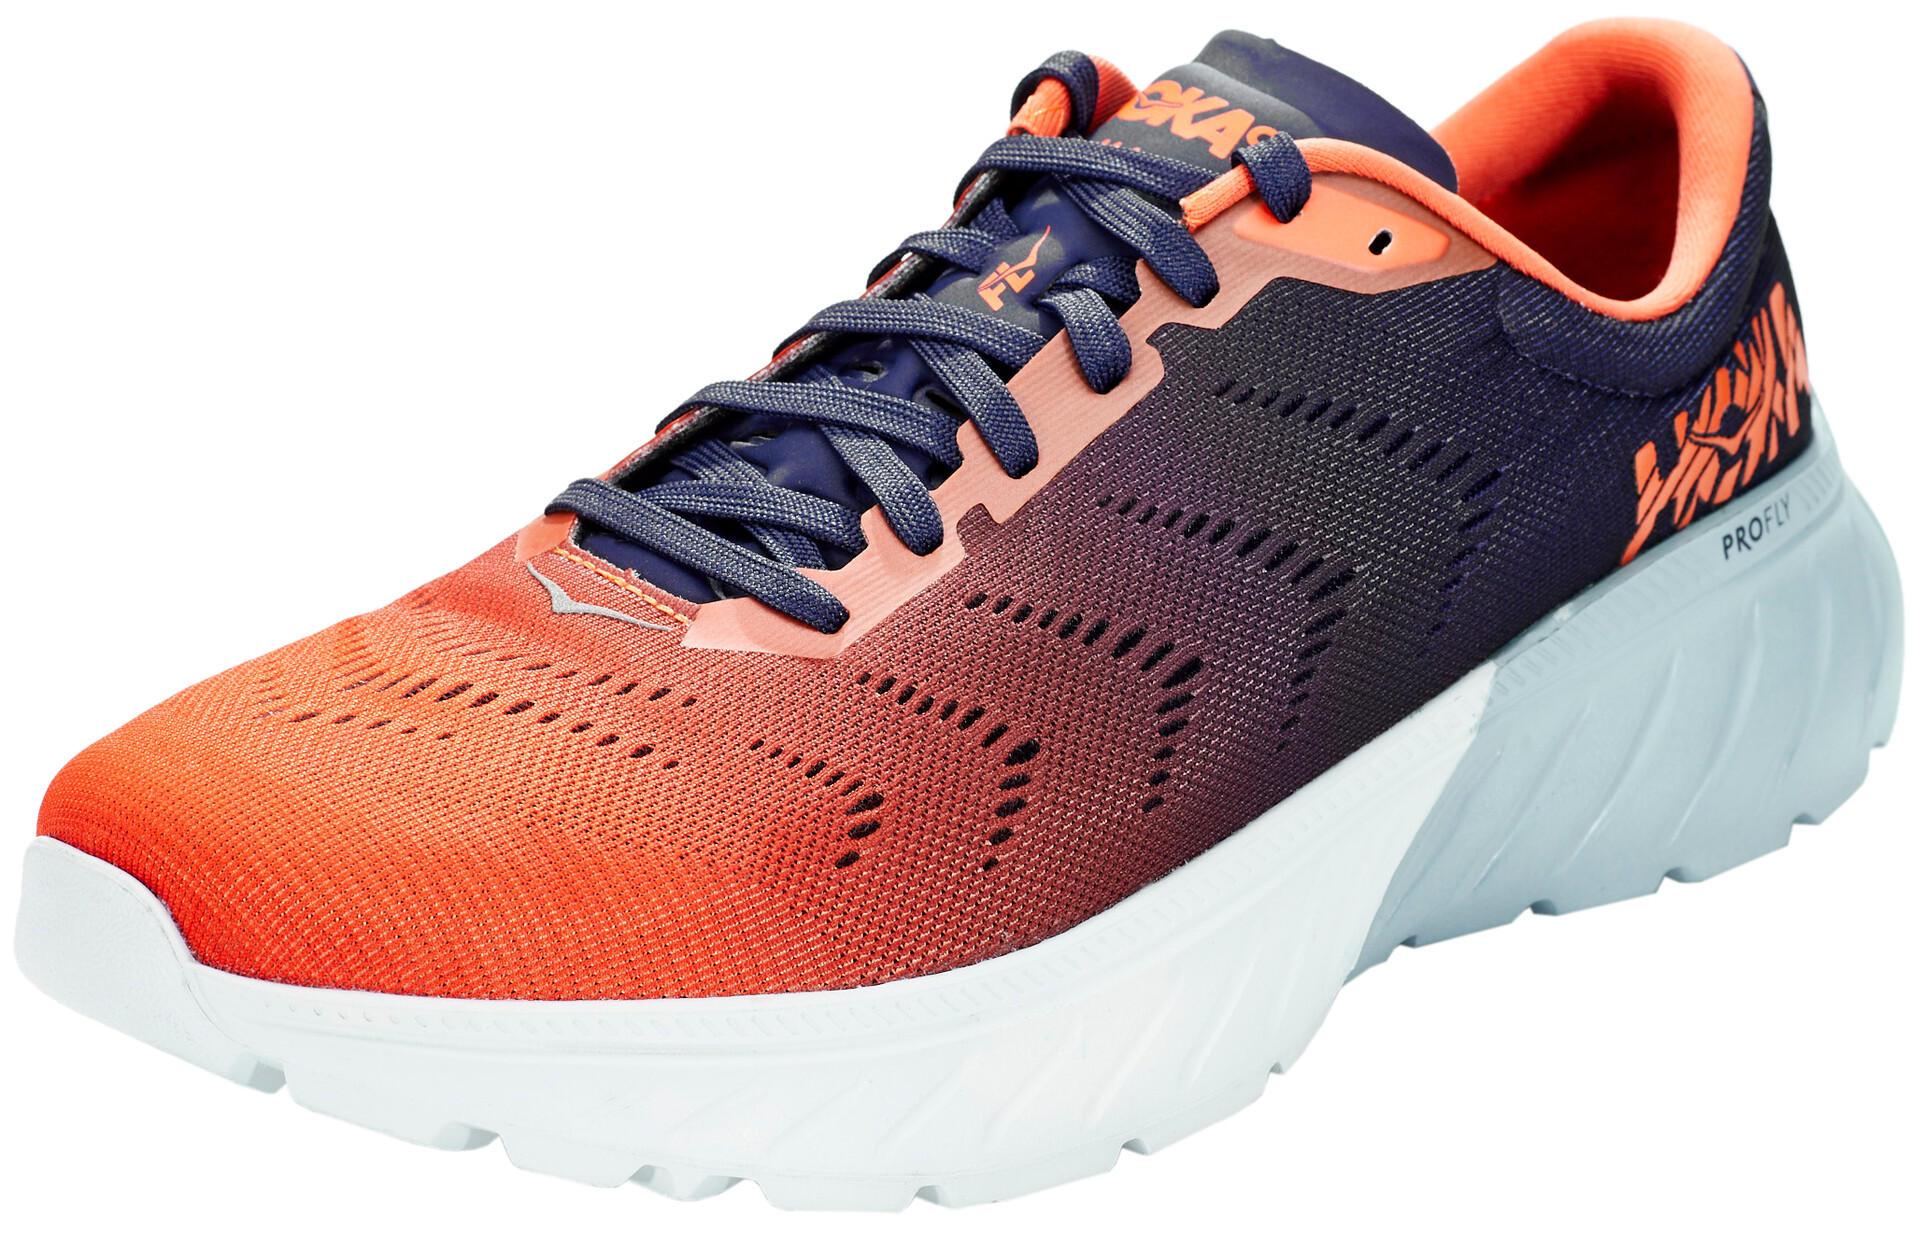 Hoka One One Mach 2 Running Shoes Men